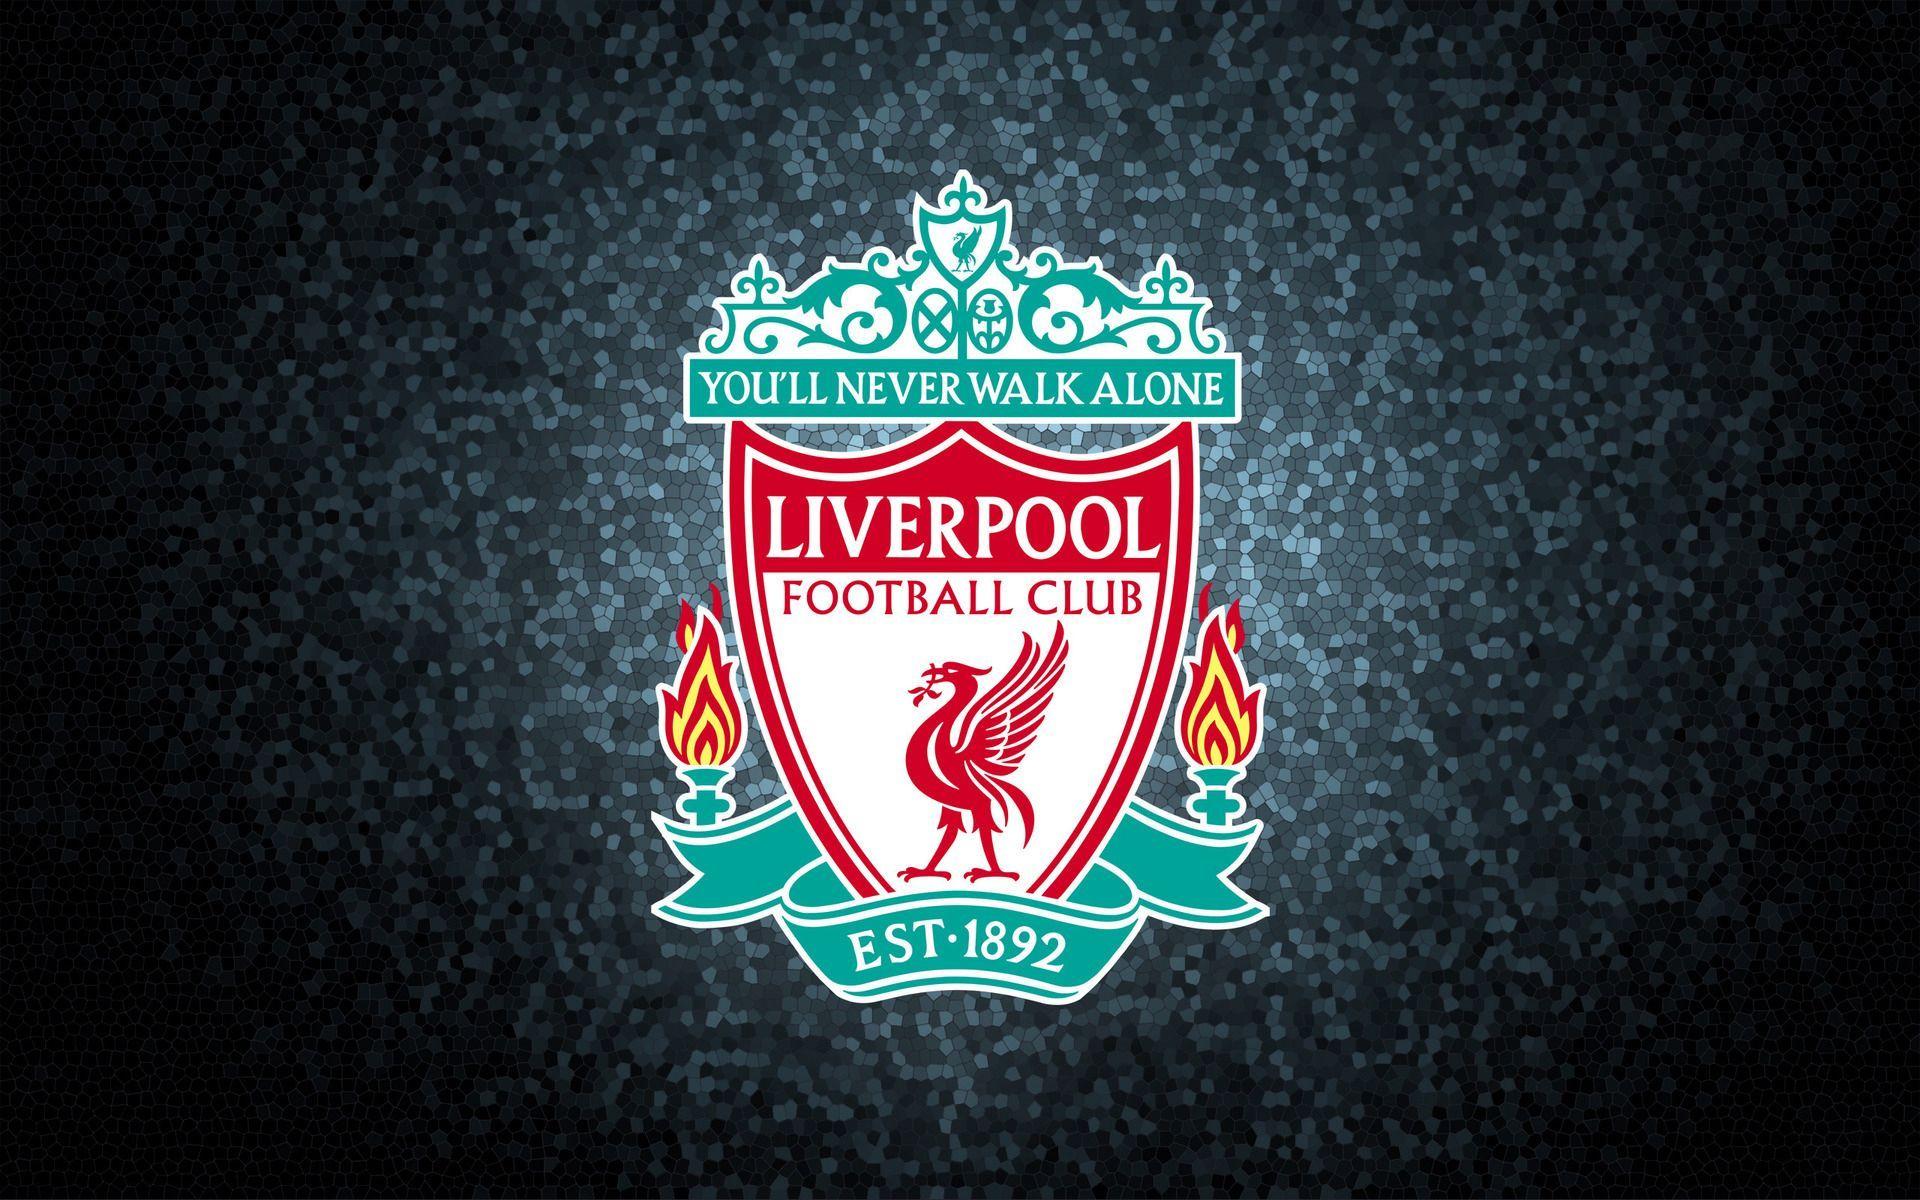 لیورپول / لیگ برتر / Premier League / Liverpool